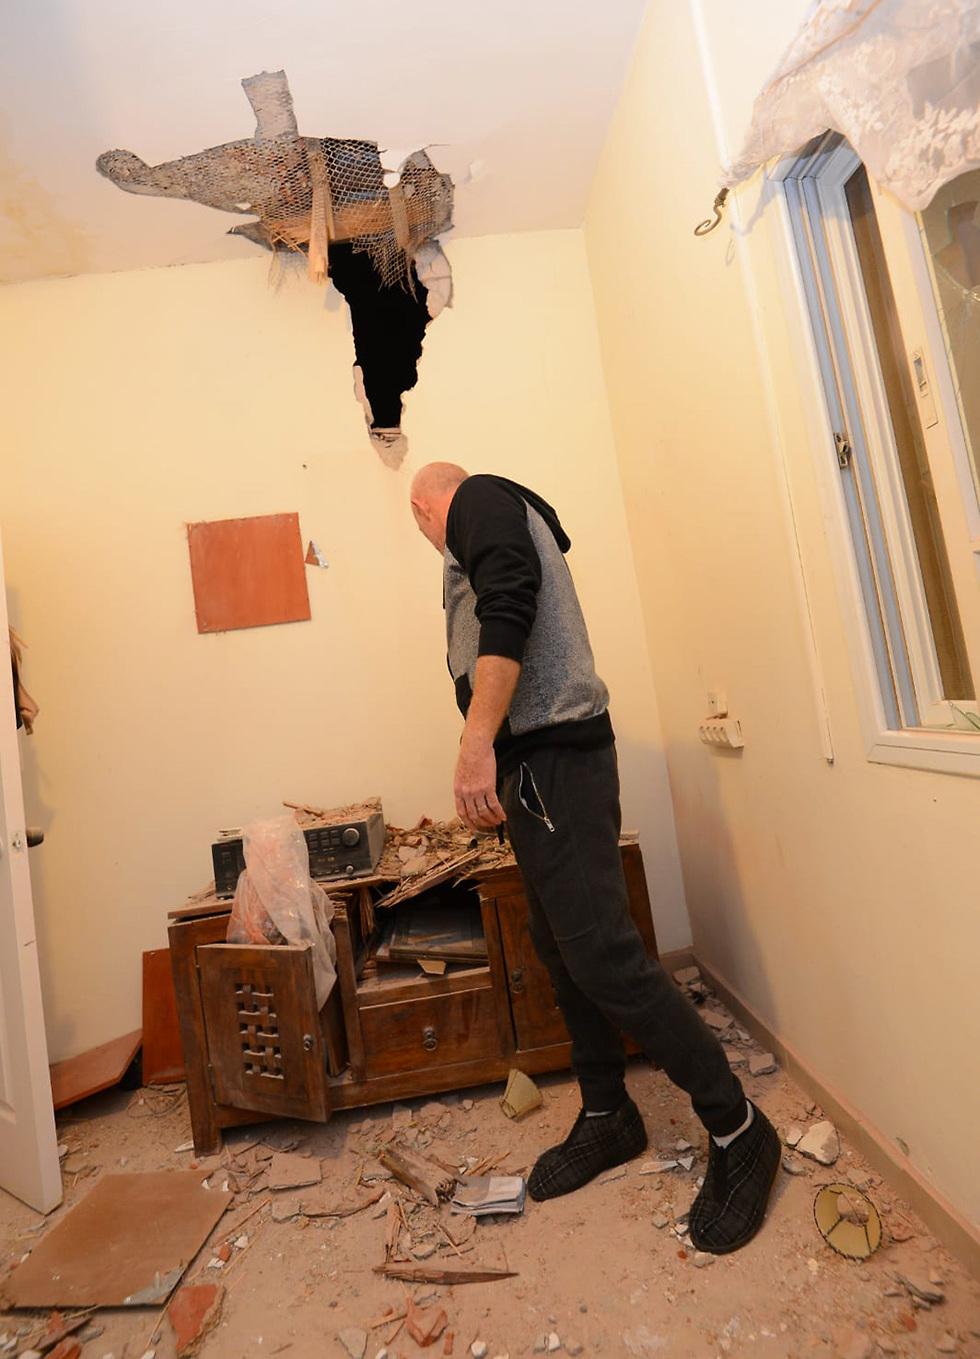 Gaza rocket directly hits a house in Sderot (Photo: Avi Rokah)